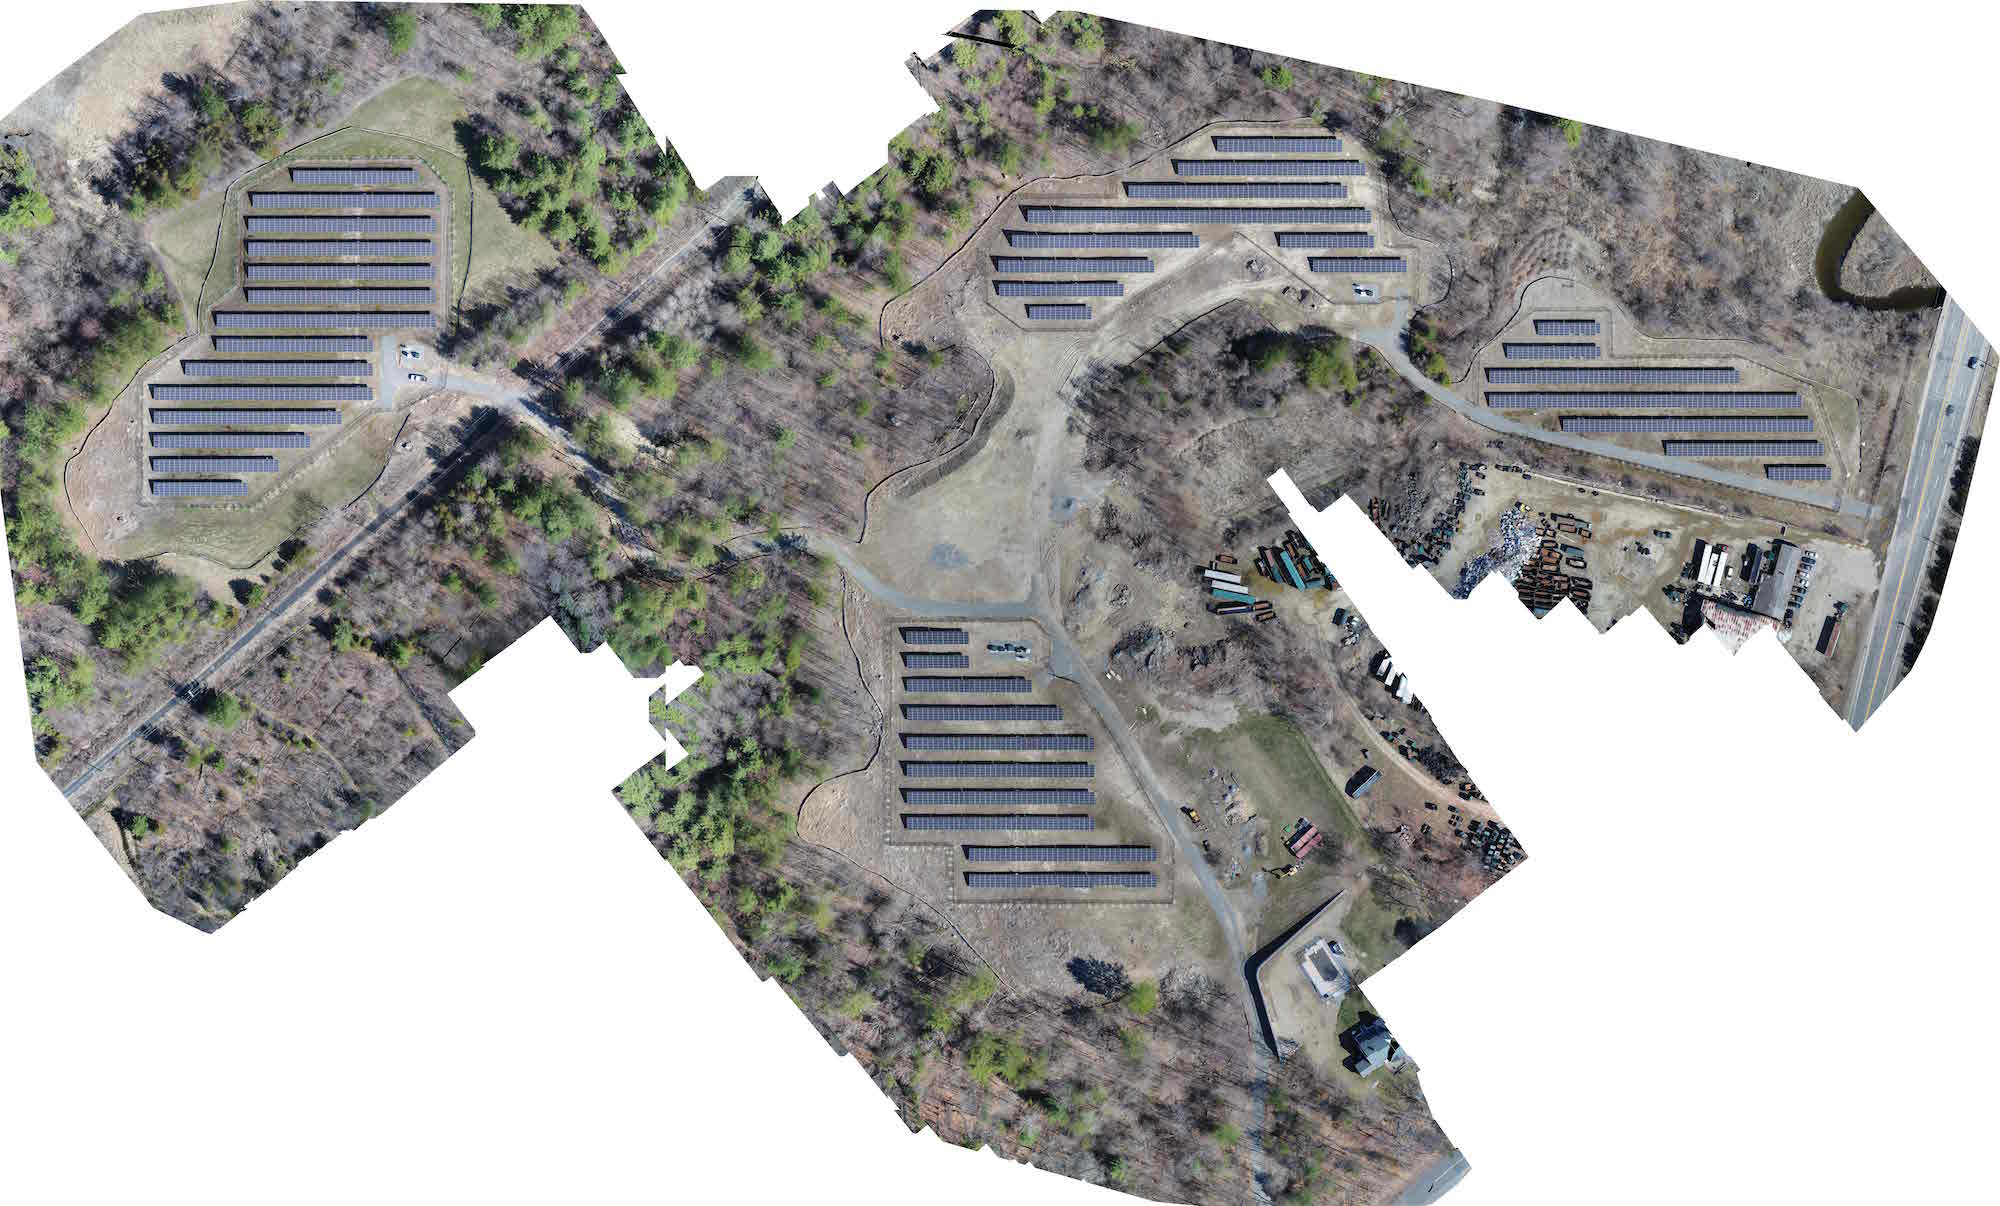 40 Acre Solar